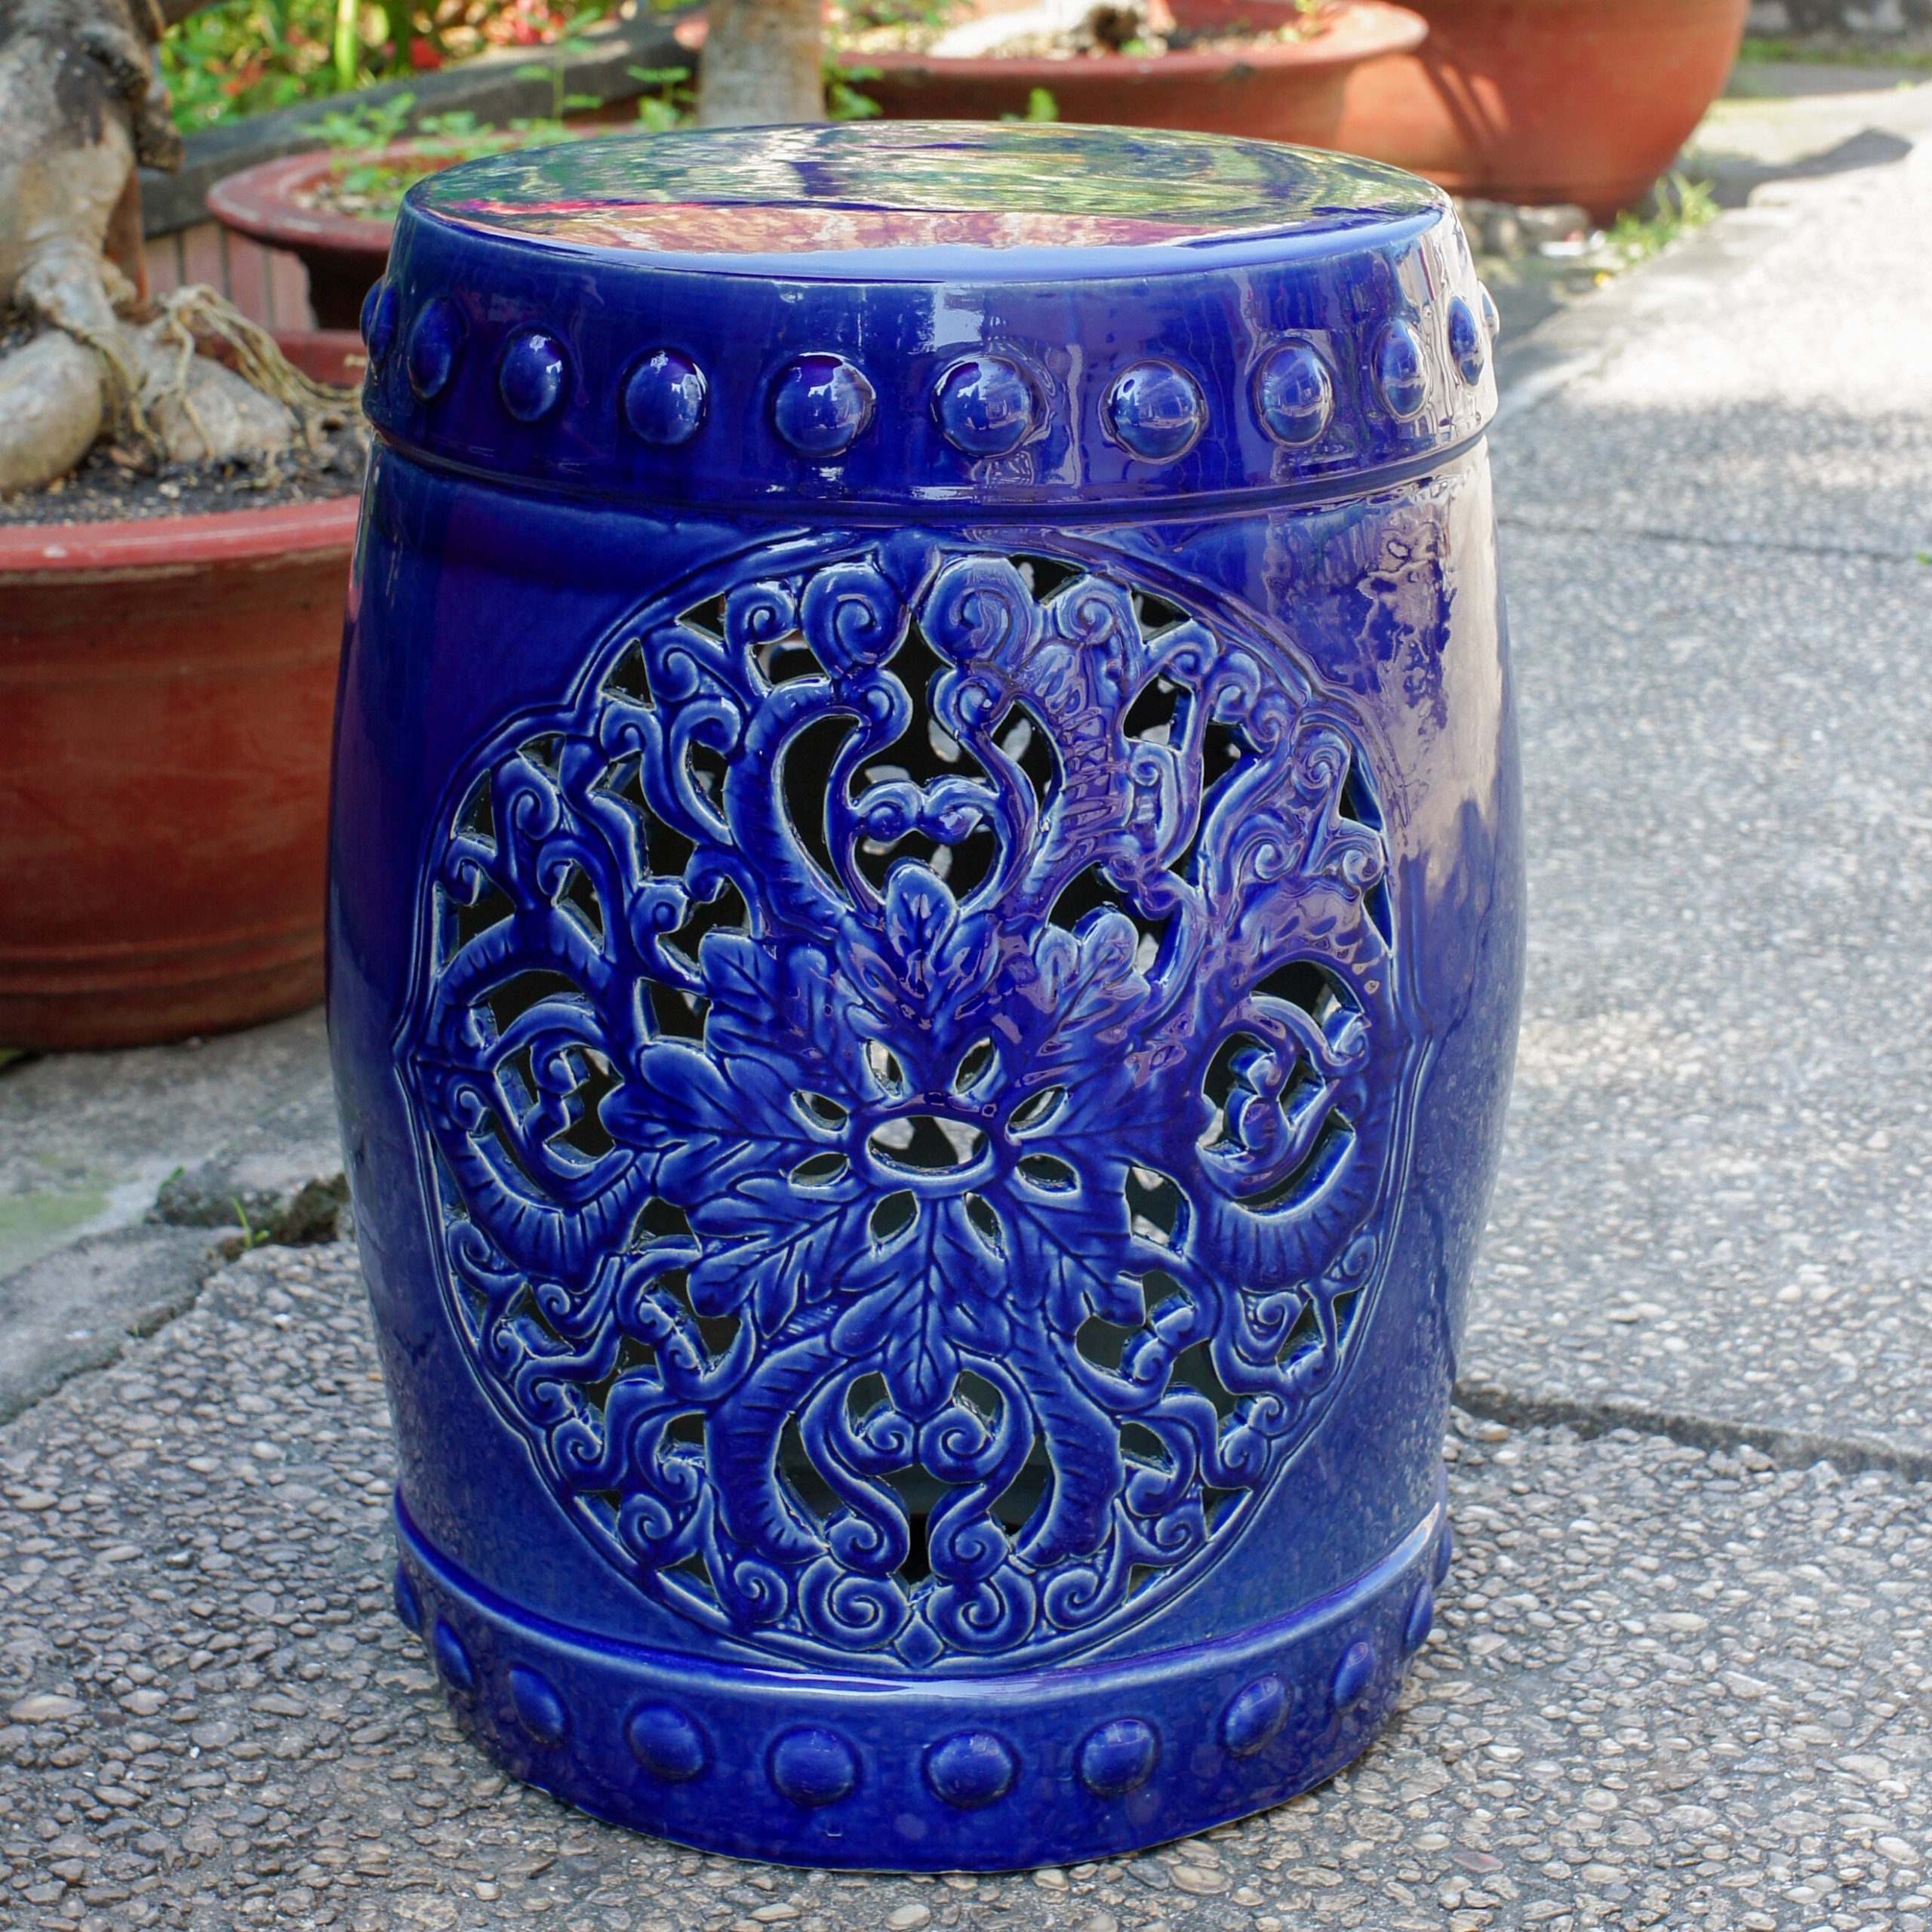 Nieto Ceramic Garden Stool Within Oakside Ceramic Garden Stools (View 2 of 25)